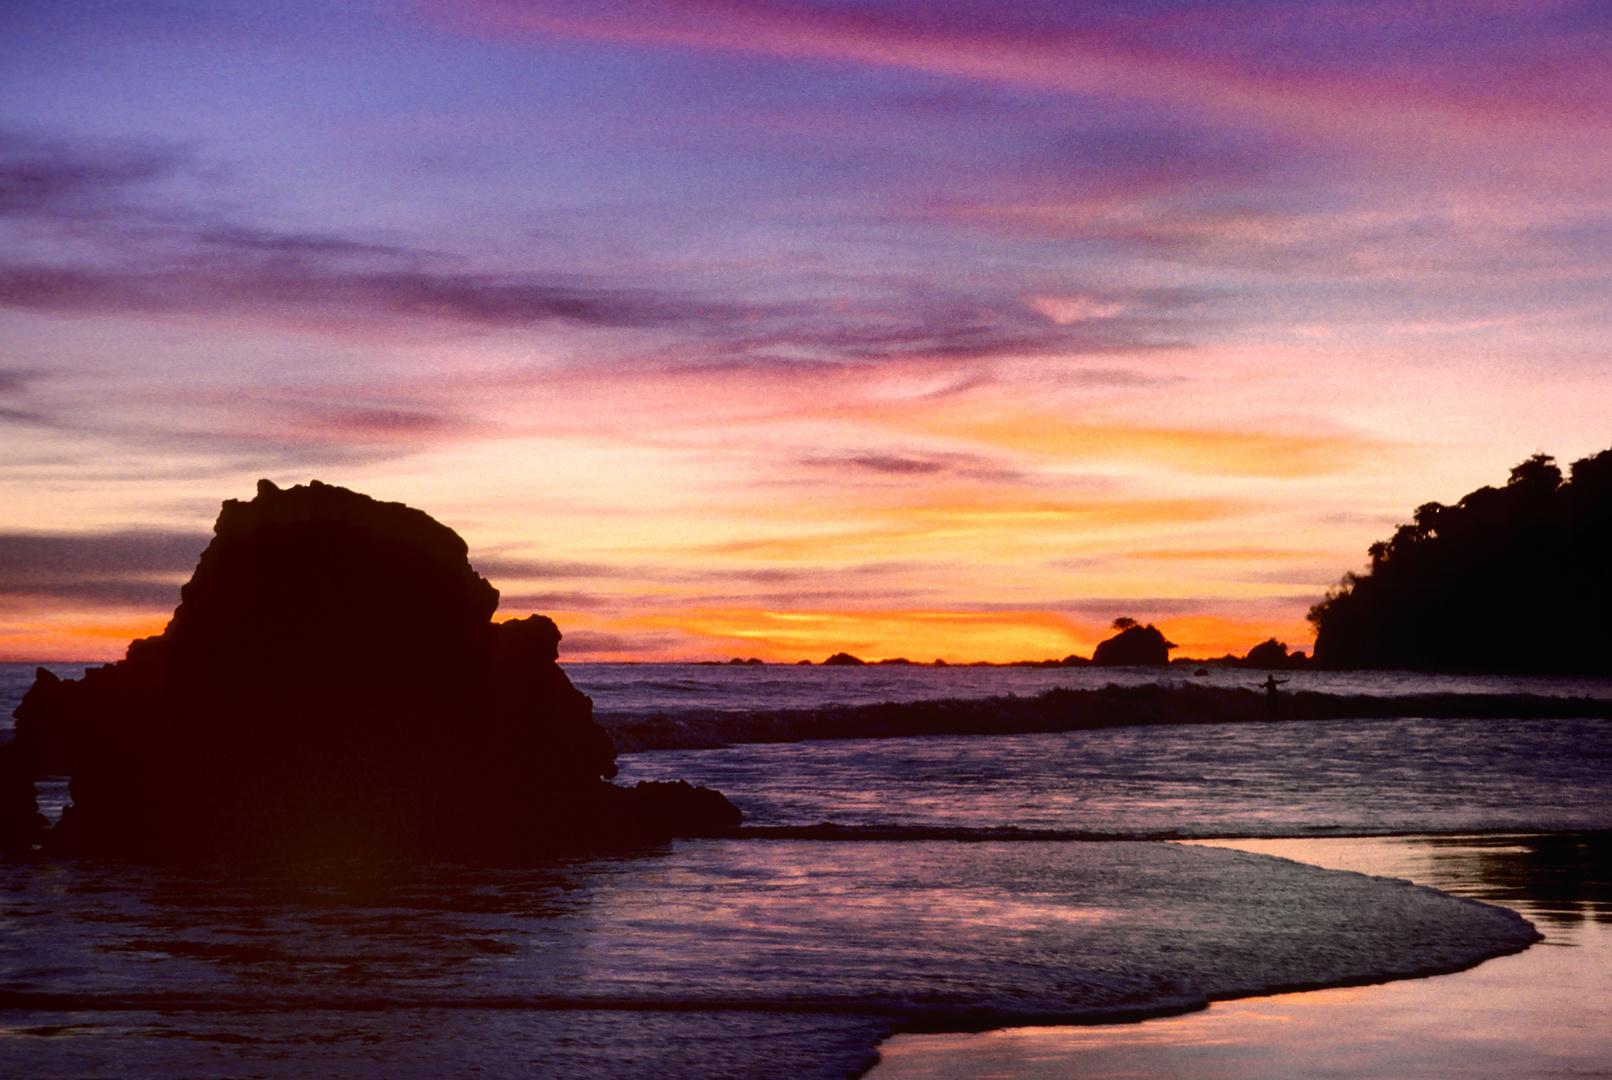 Farbenpracht an der Playa Manuel Antonio